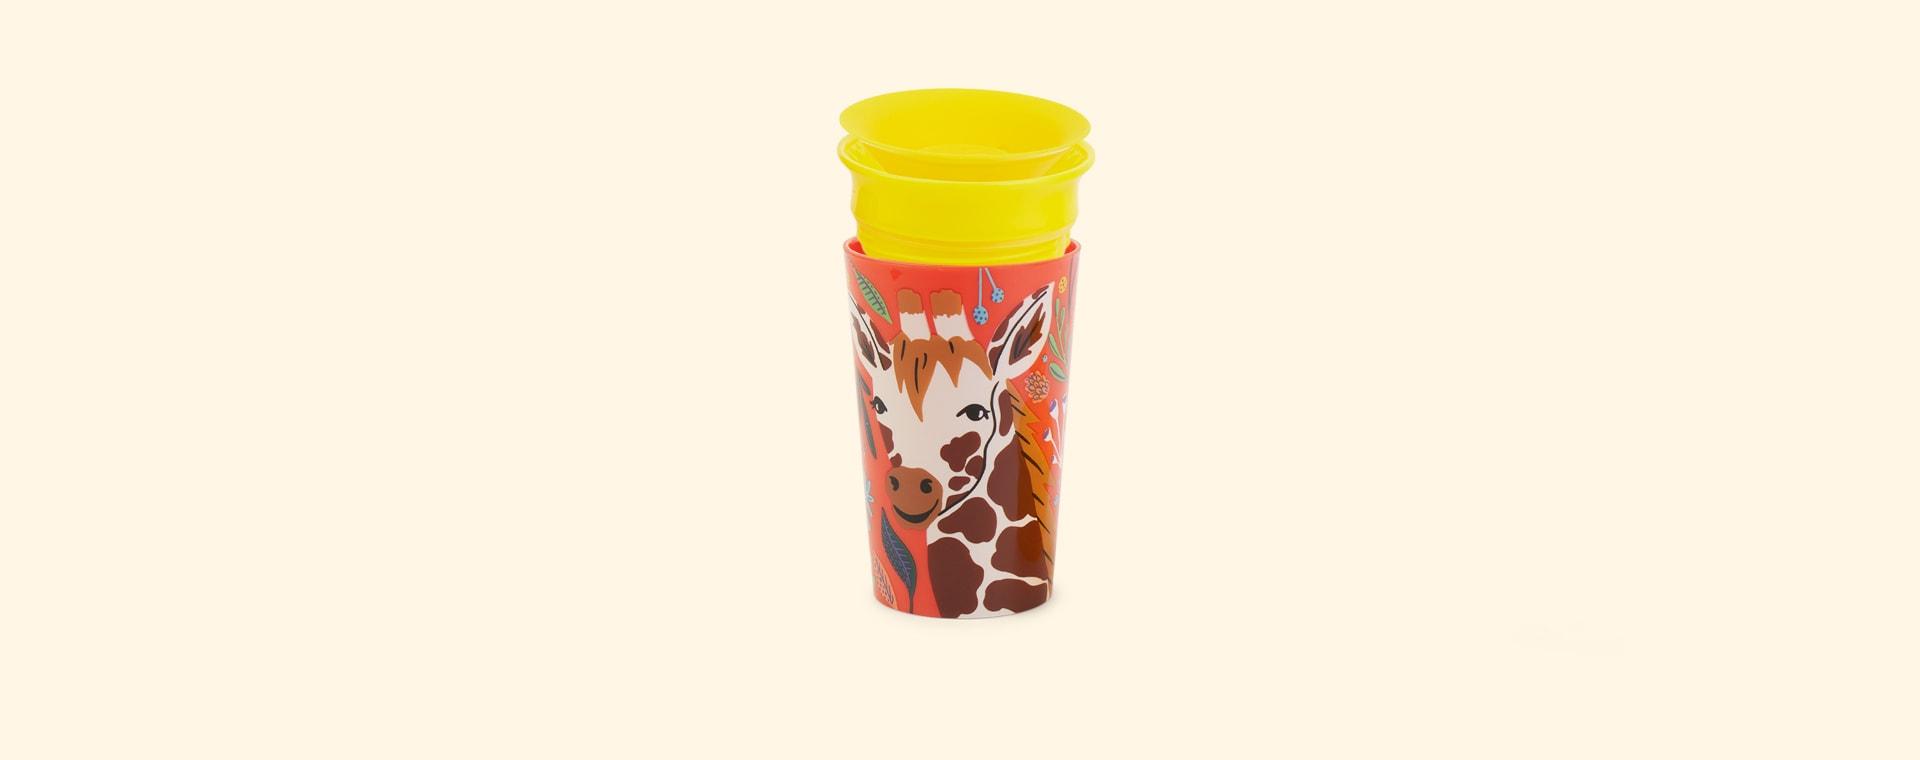 Giraffe Munchkin Miracle 360 Wildlove Sippy Cup